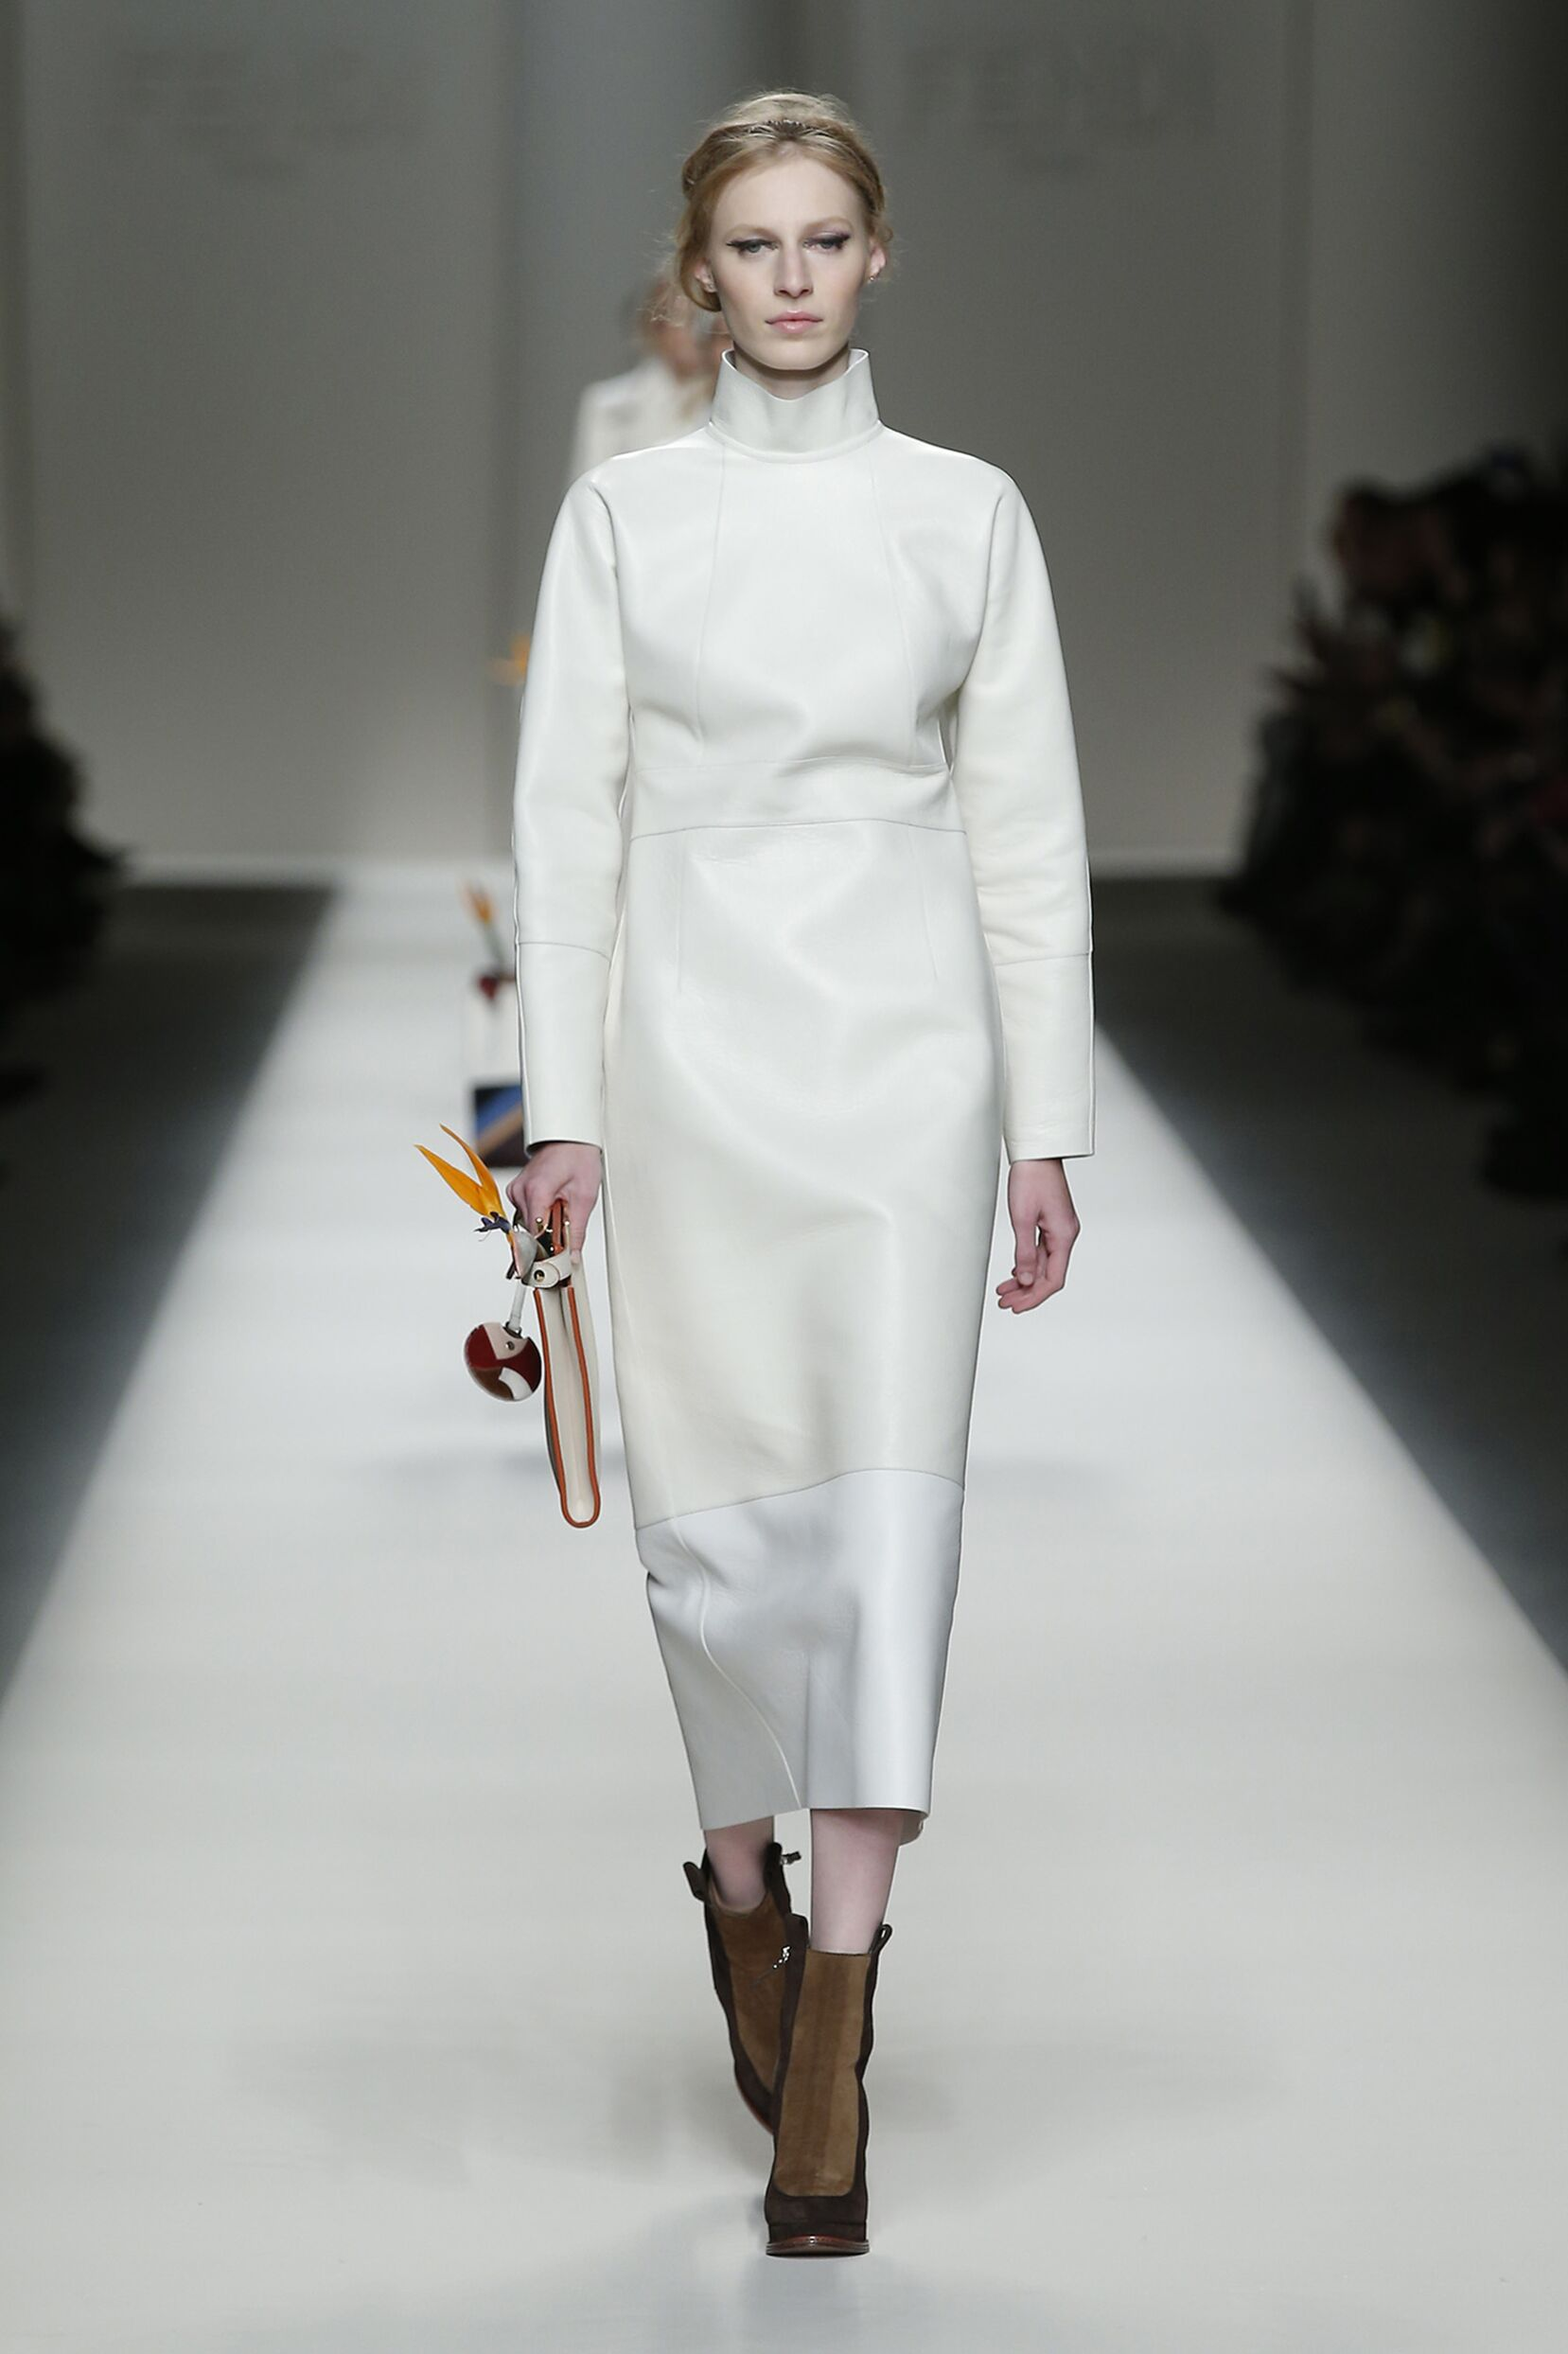 Winter 2015 Fashion Show Fendi Collection